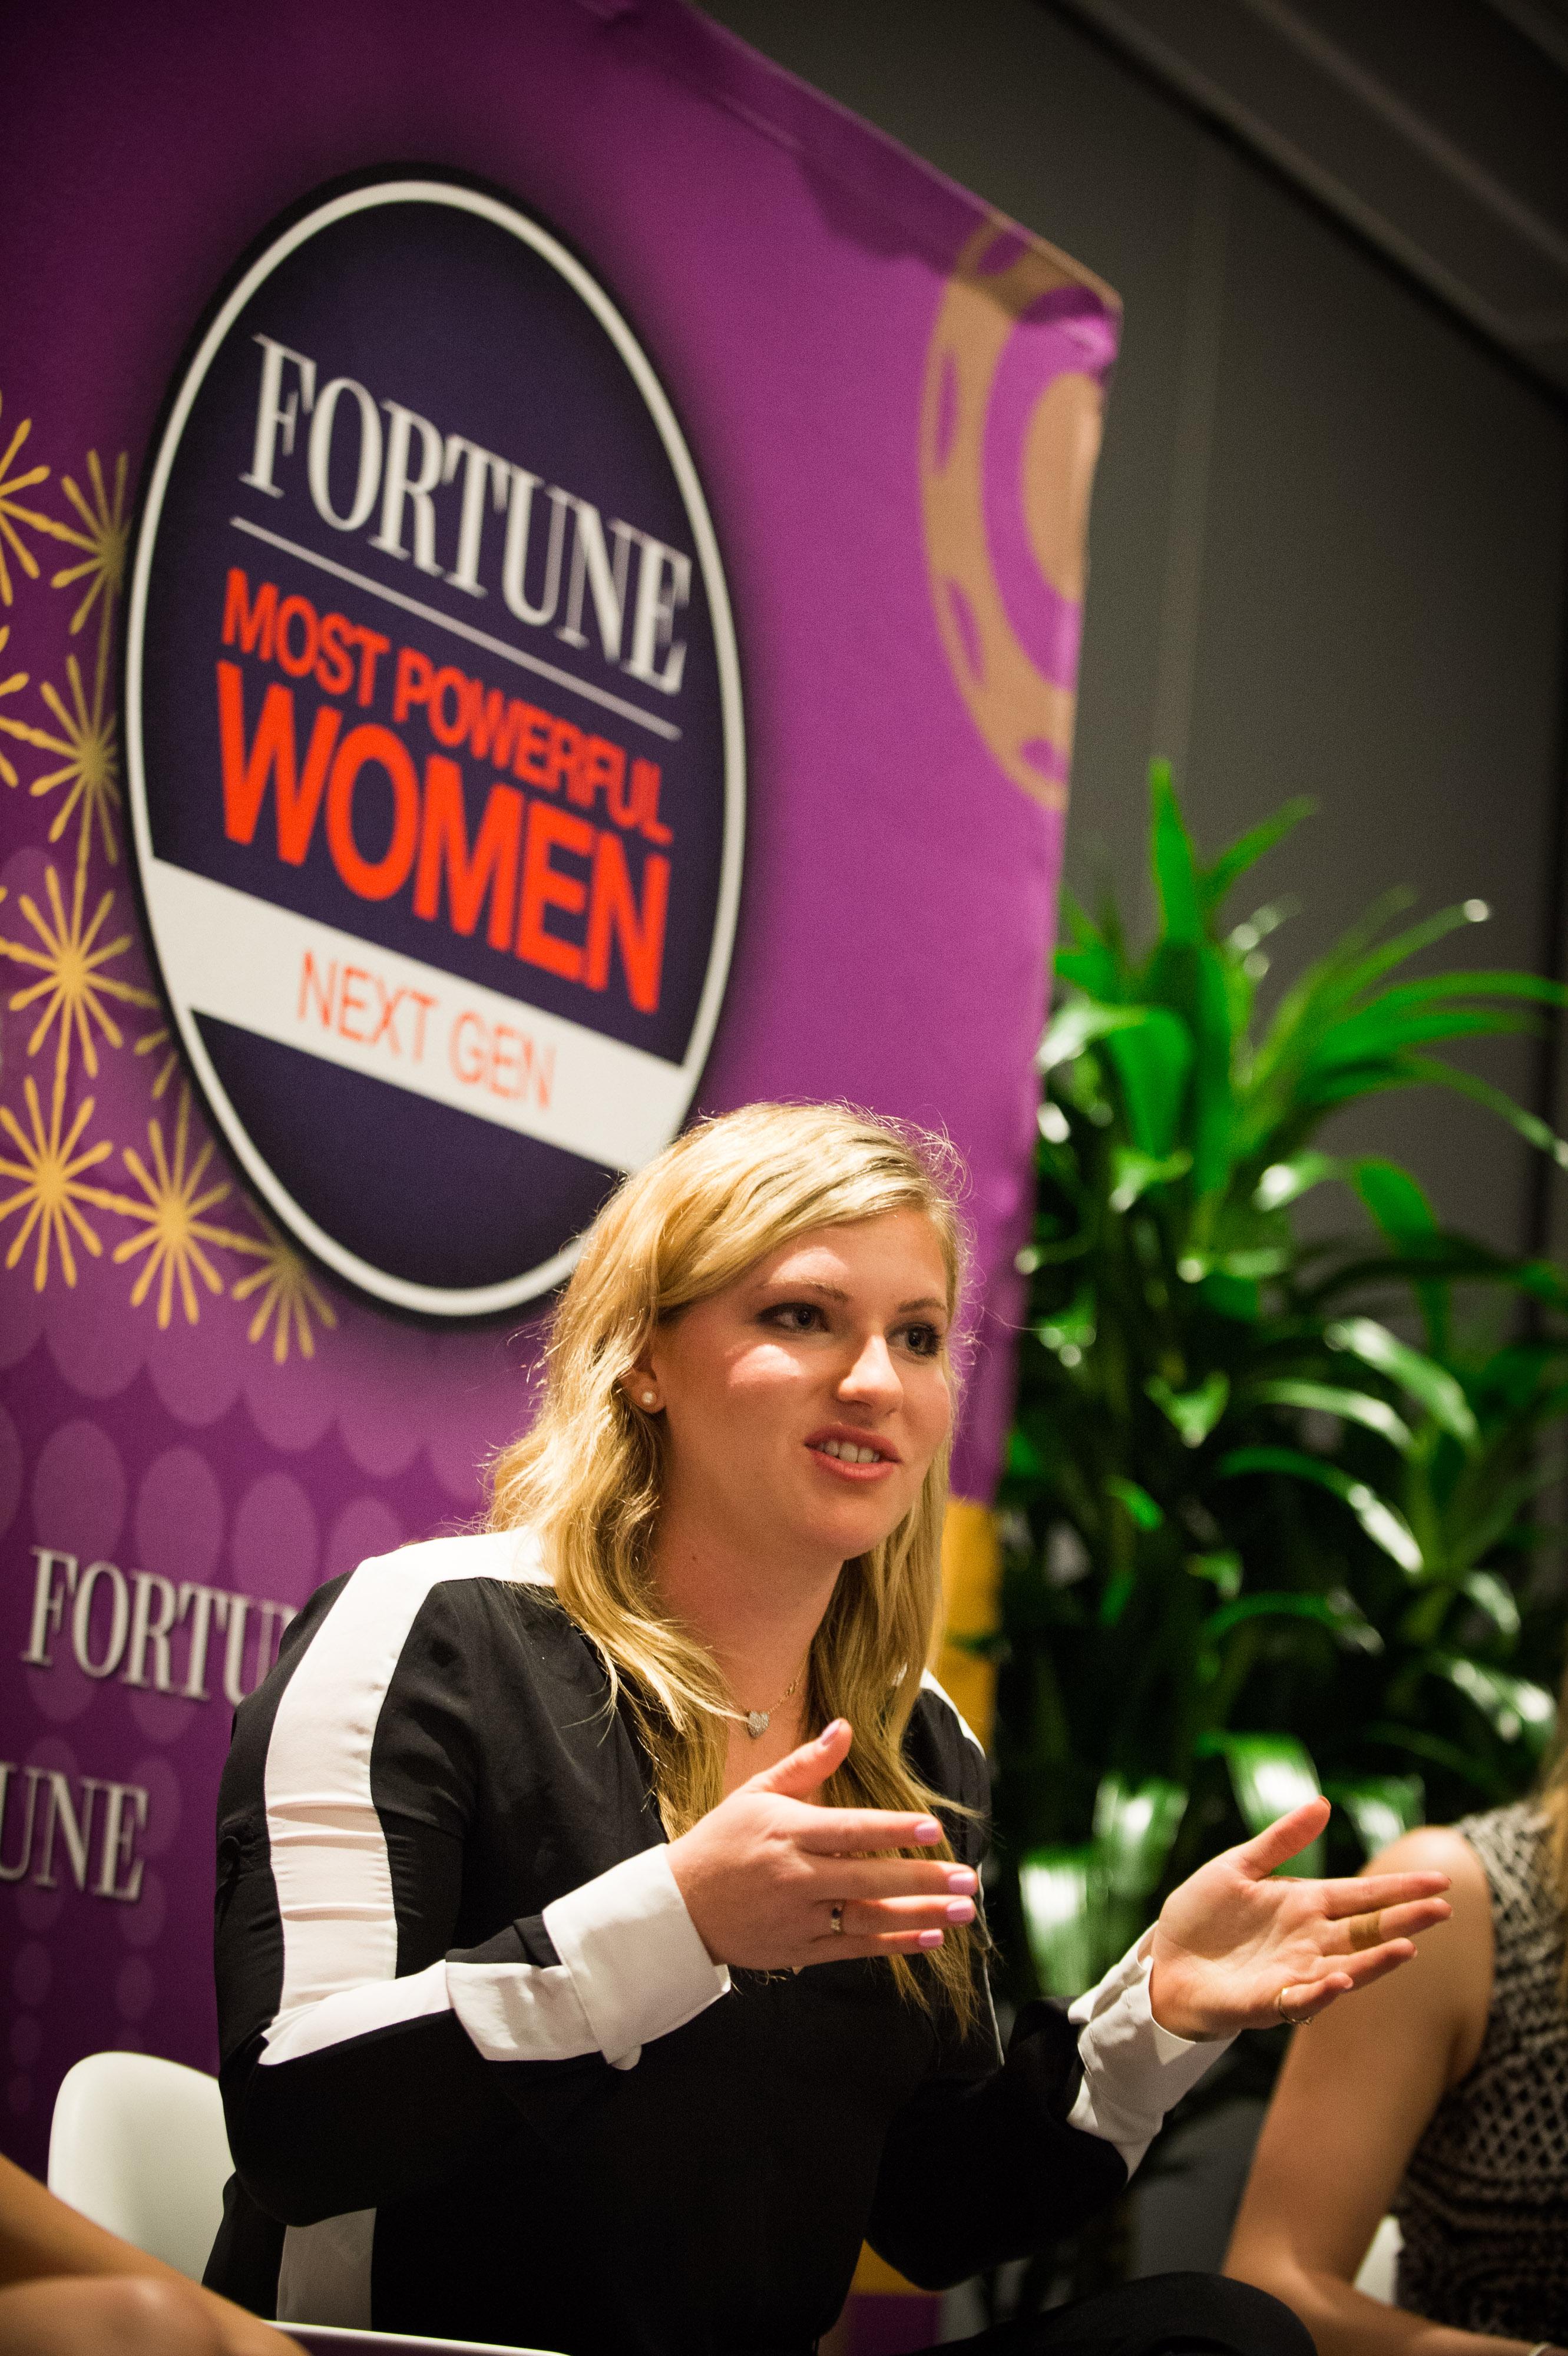 Fortune Most Powerful Women Next Generation